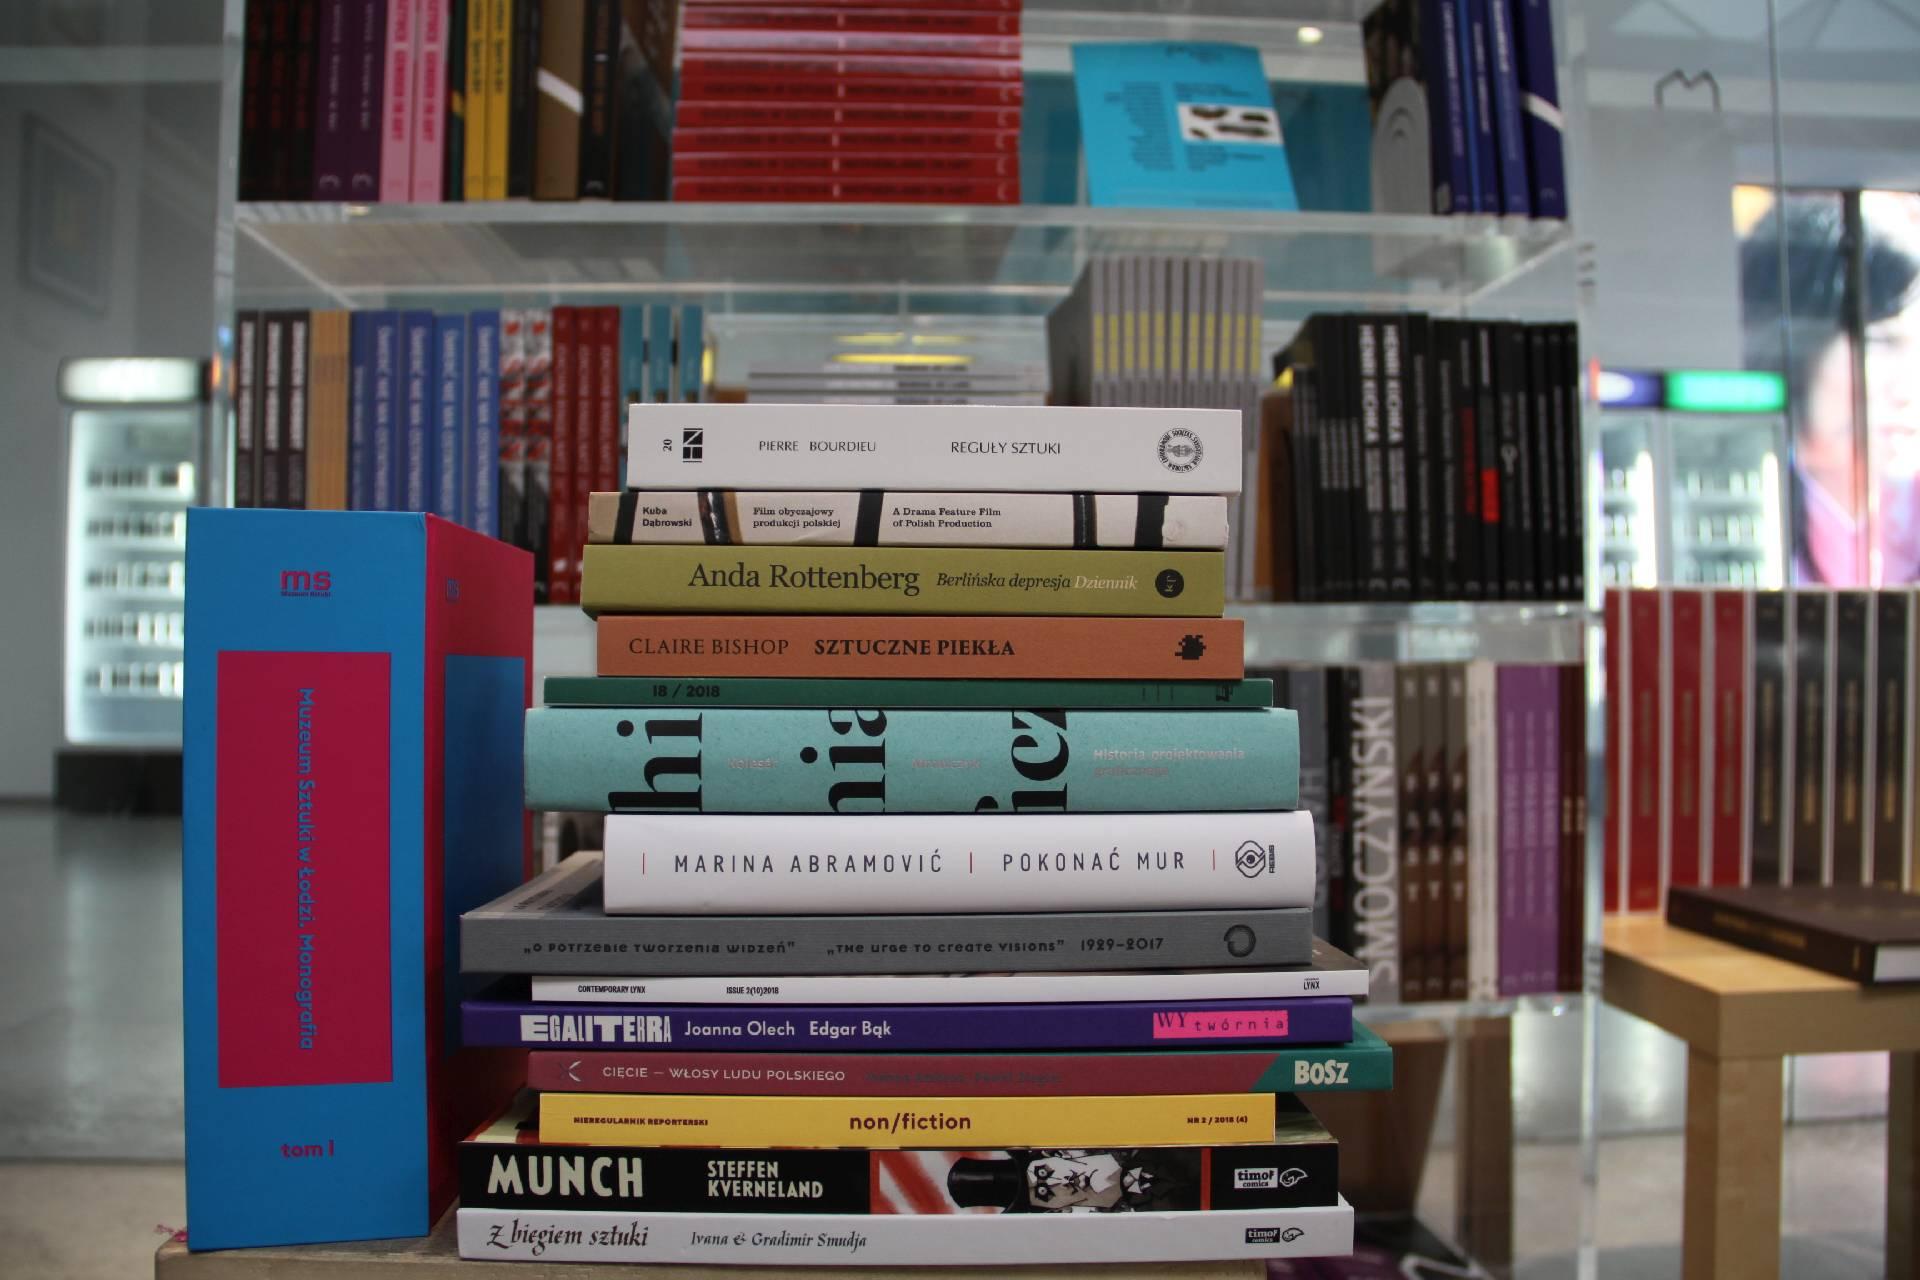 MOCAK Bookstore, fot. R. Sosin (źródło: materiały prasowe organizatora)